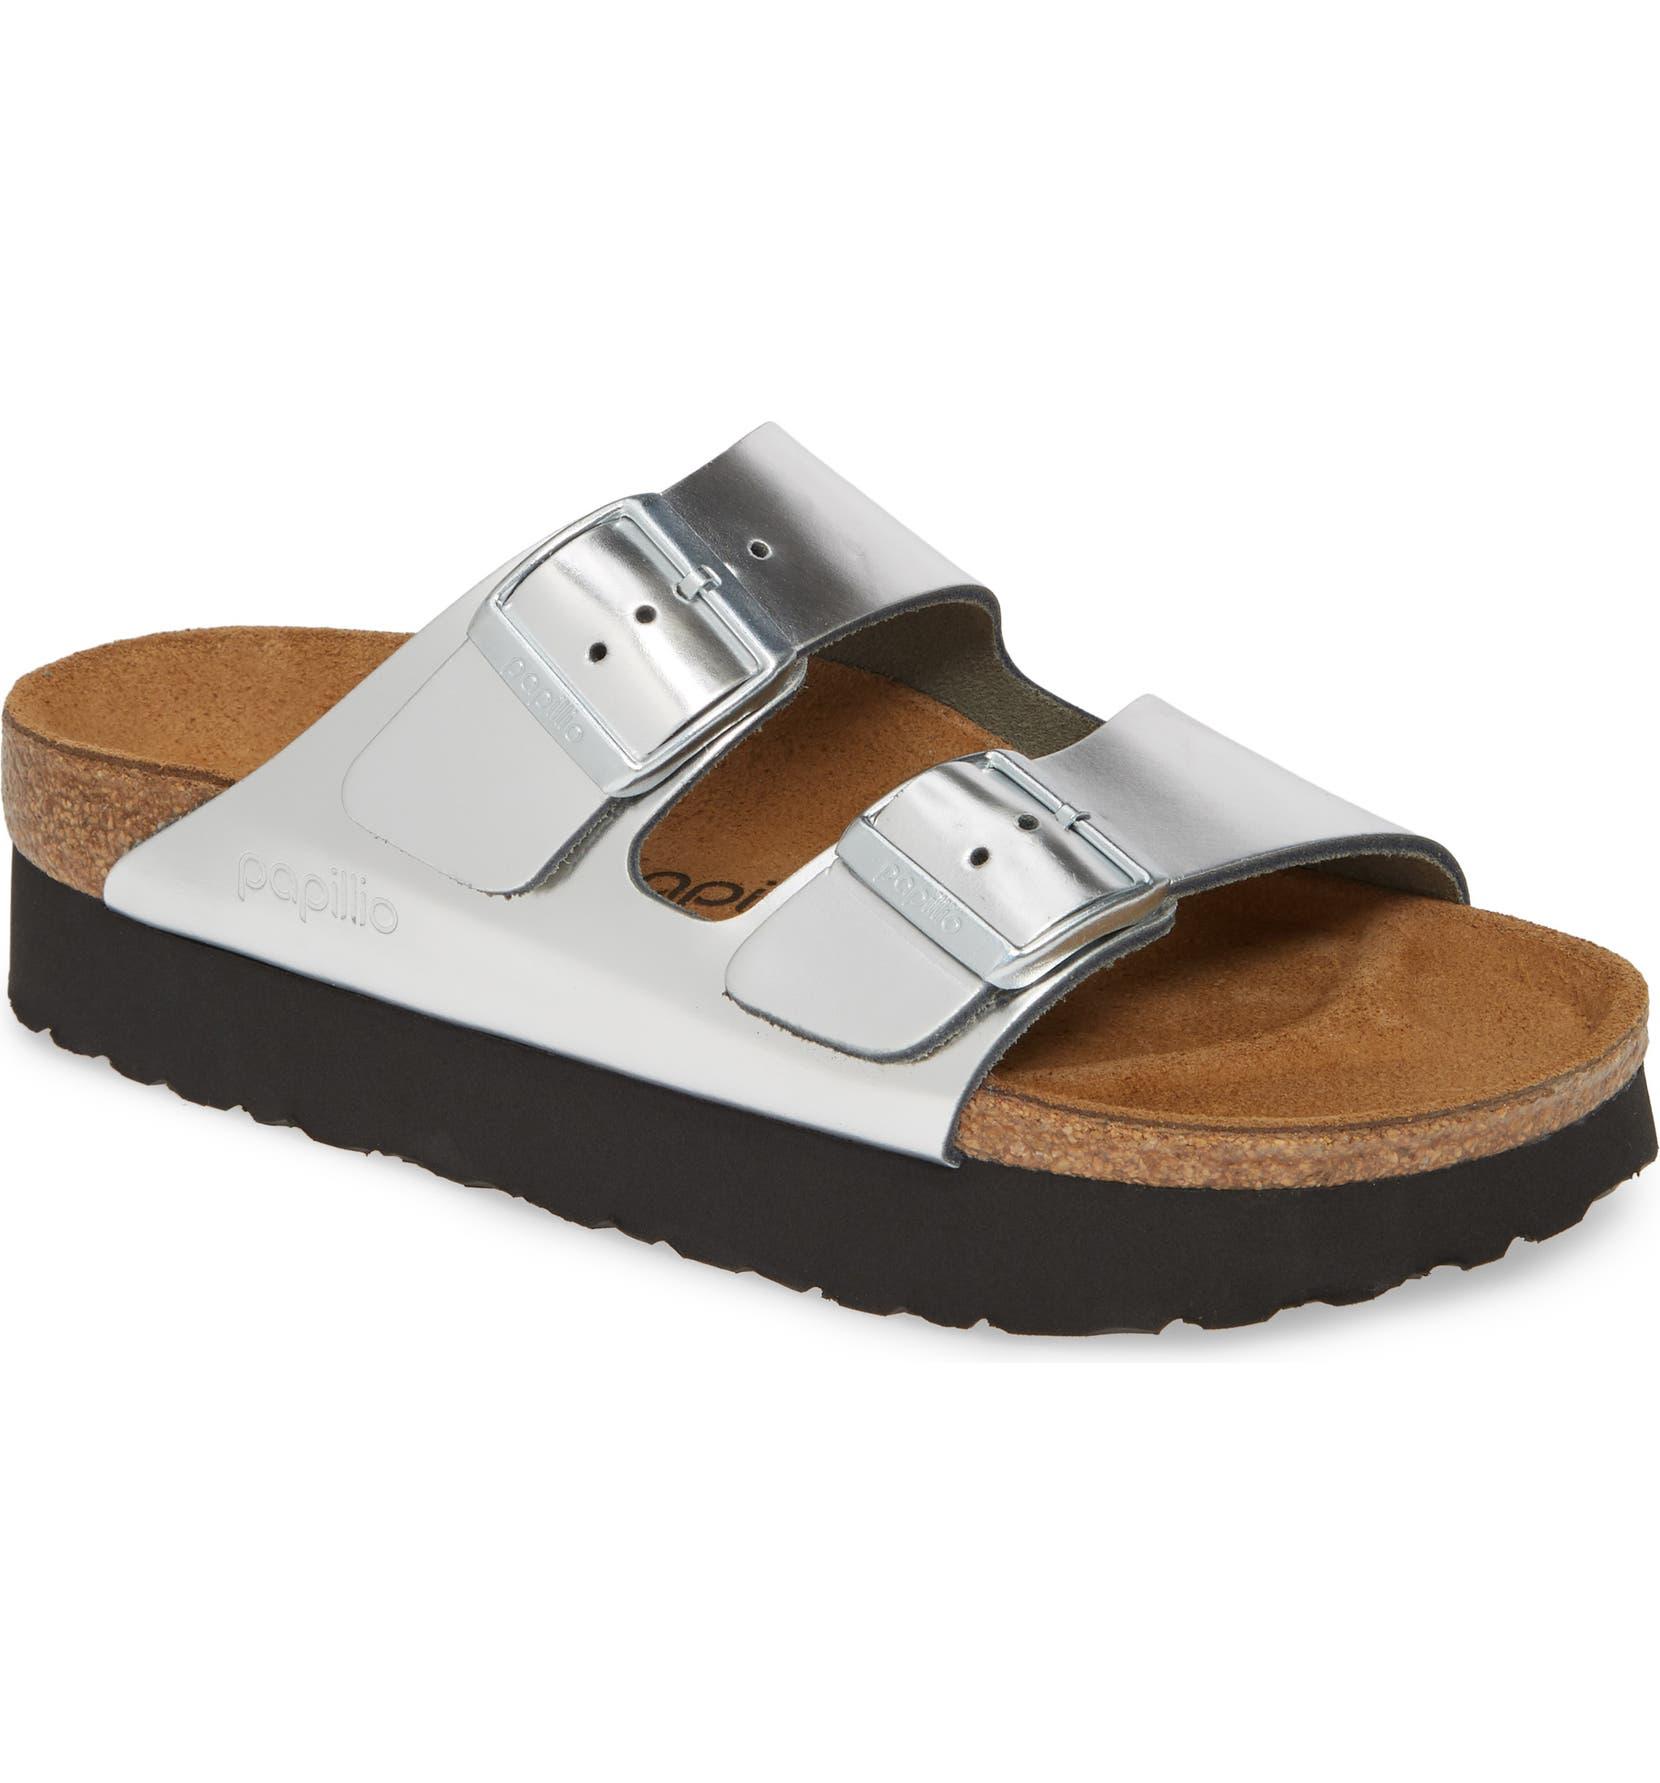 89b2ab89a6c2 Papillio by Birkenstock  Arizona - Birko-Flor  Platform Sandal (Women)